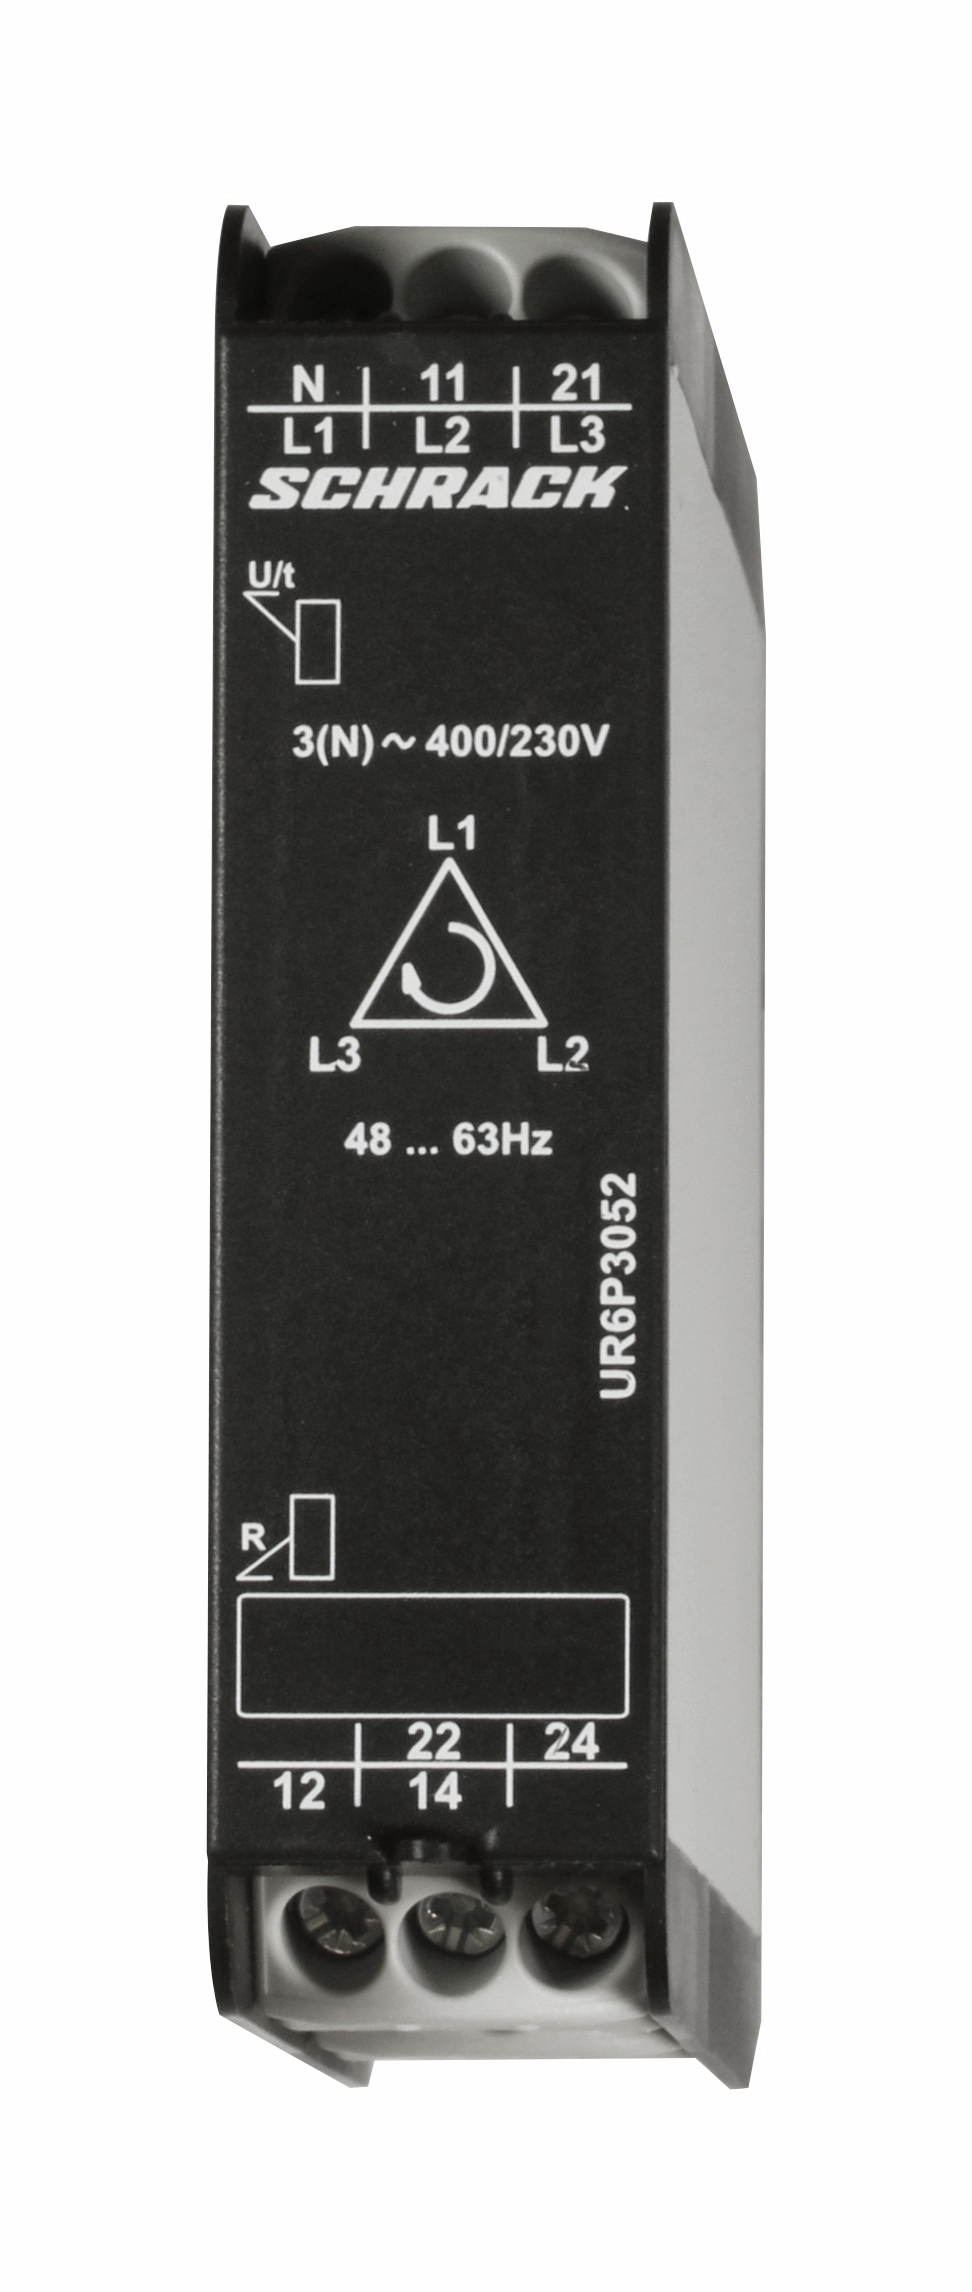 UR6P3052 - Schrack Technik